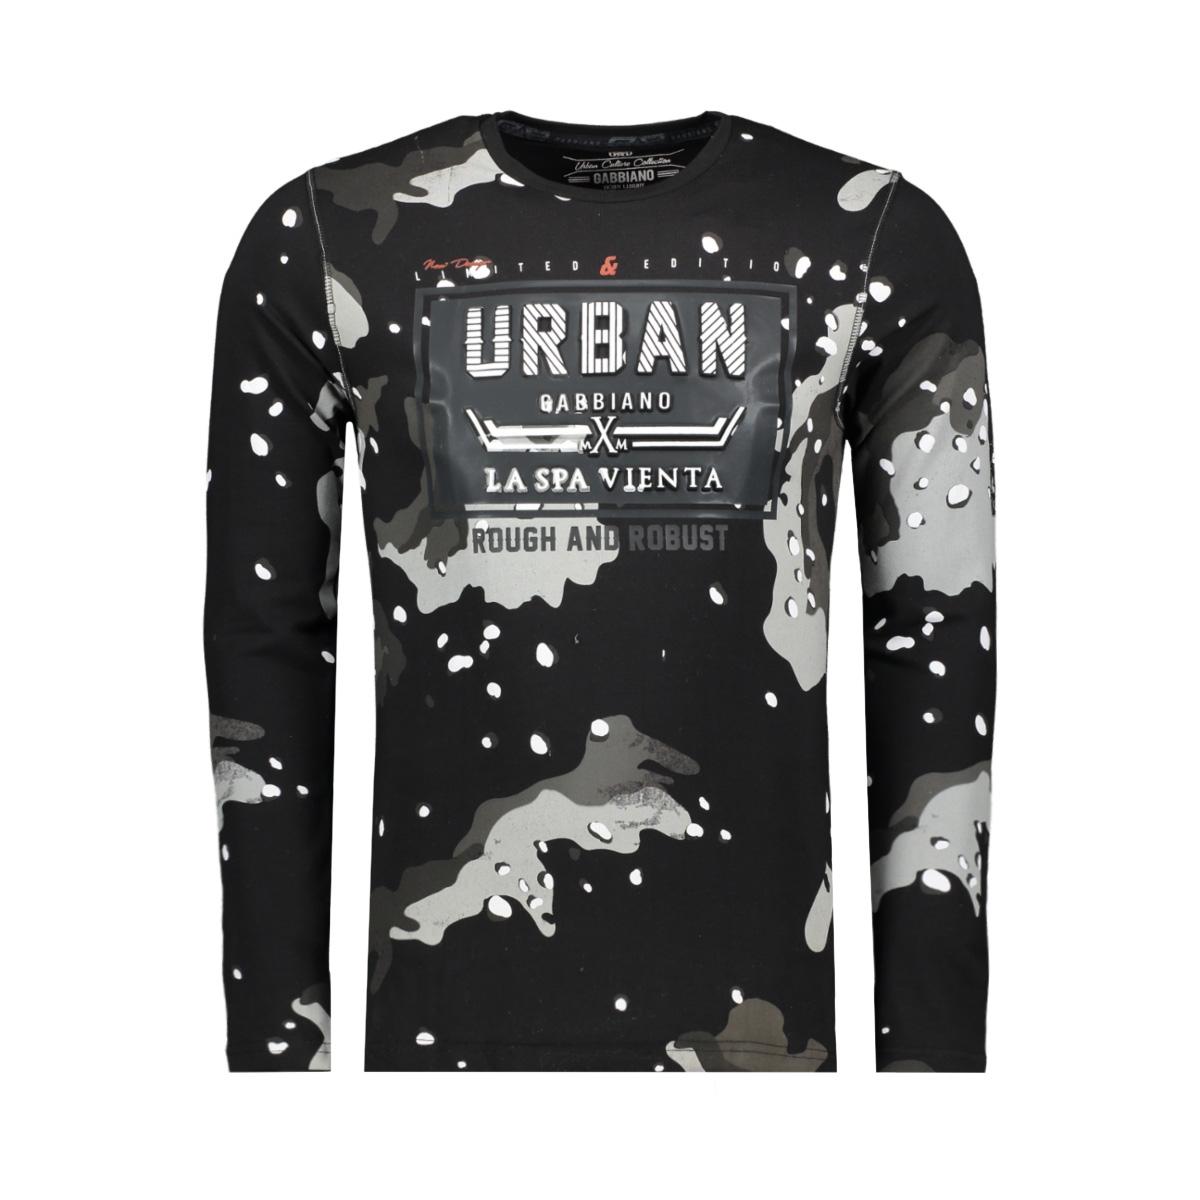 t shirt allover print en tekst 13858 gabbiano t-shirt black